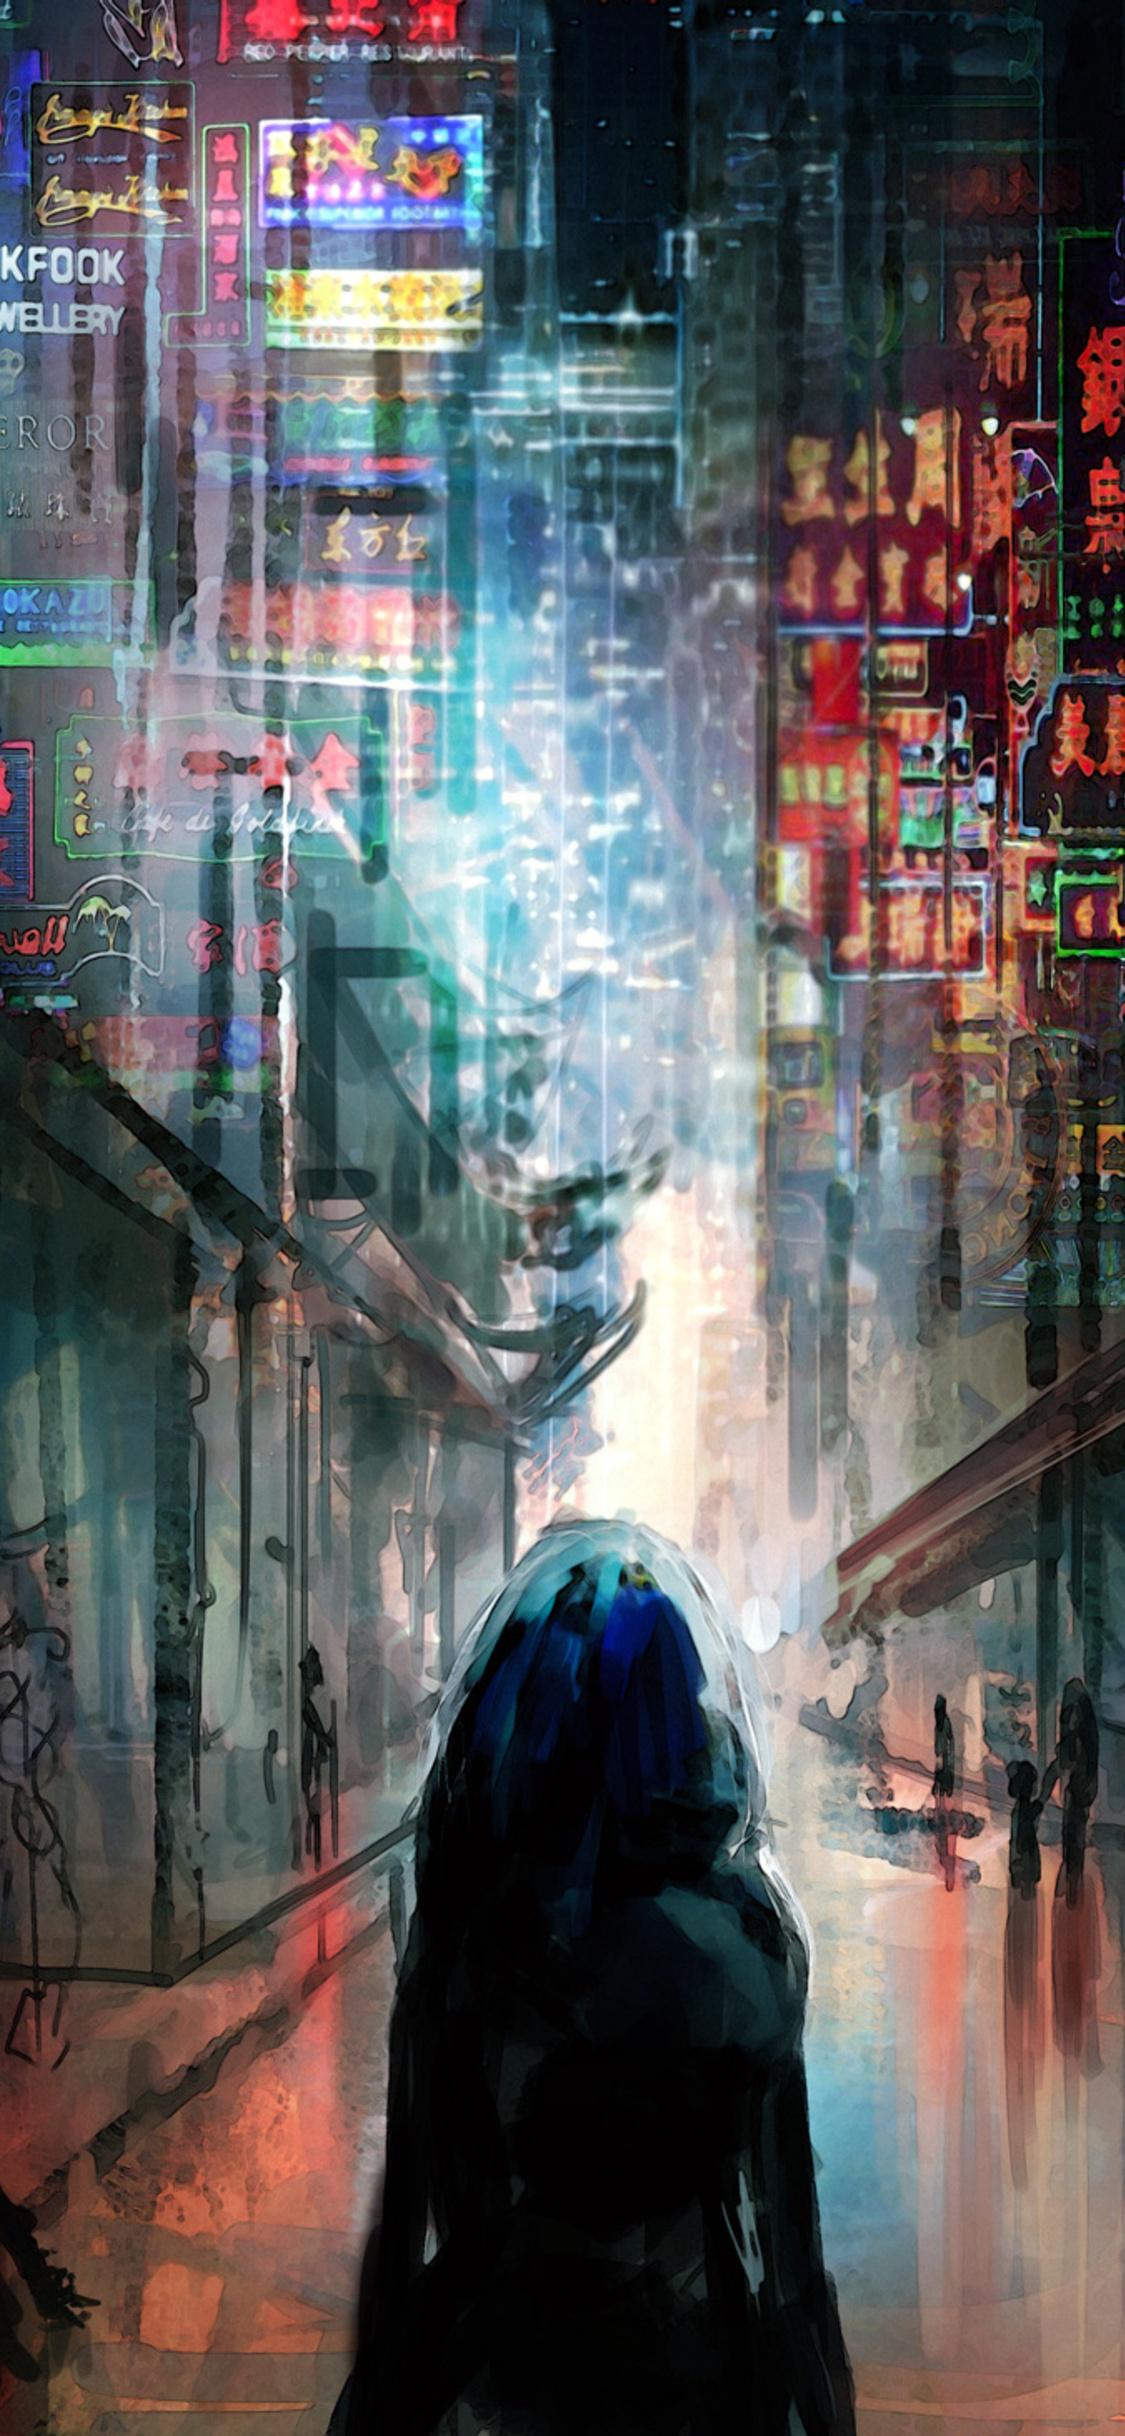 1125x2436 Anime Cyberpunk Scifi City Lights Night Buildings